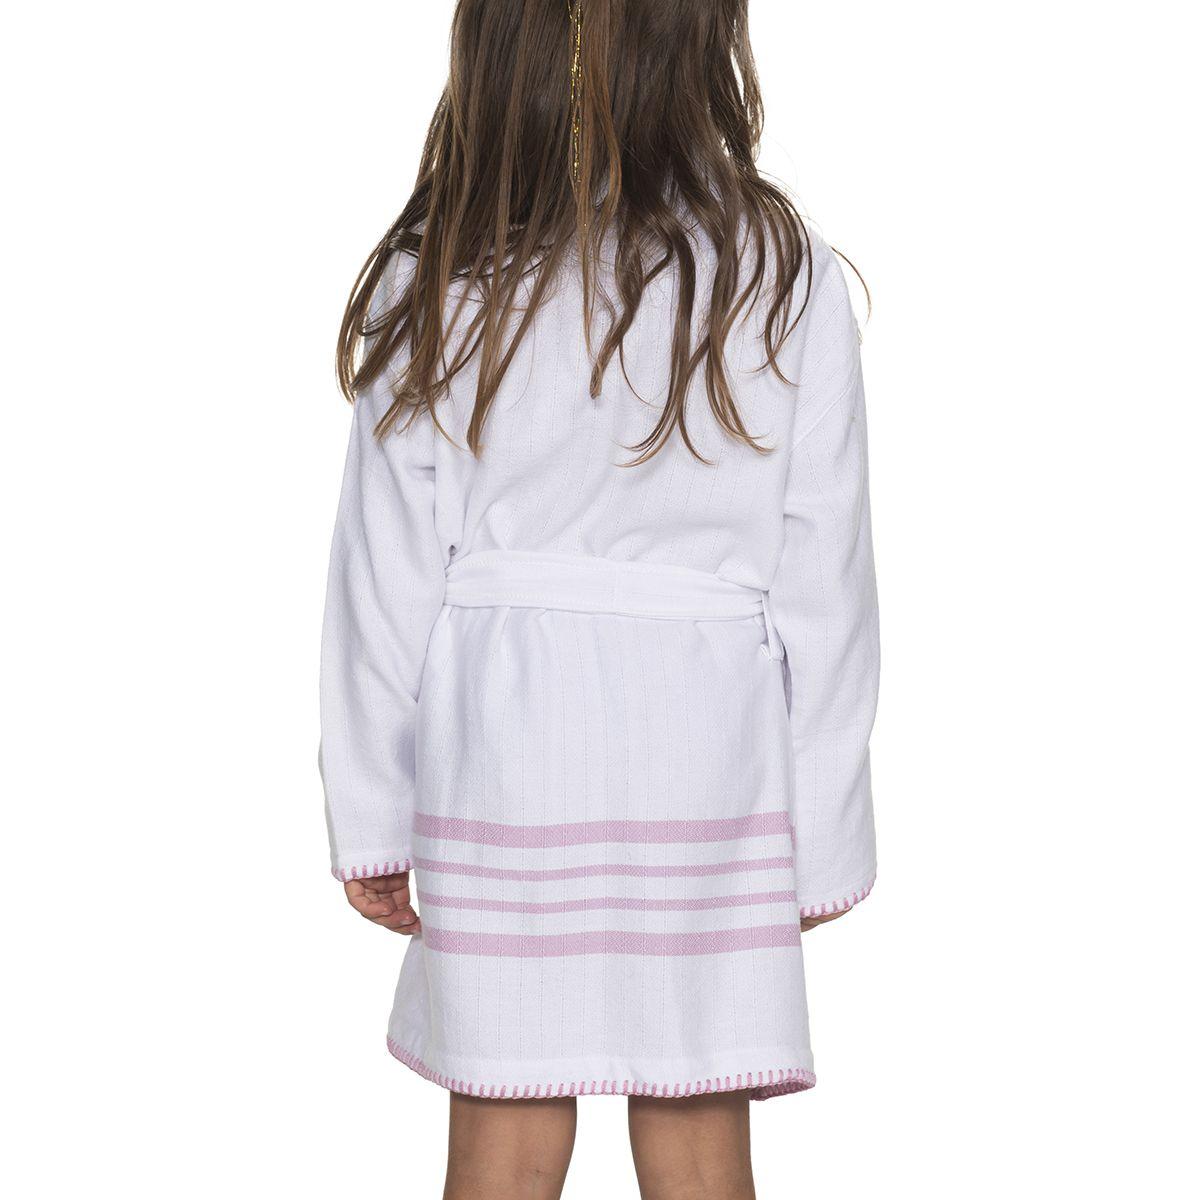 Bathrobe Kiddo Coban WS - White / Pink